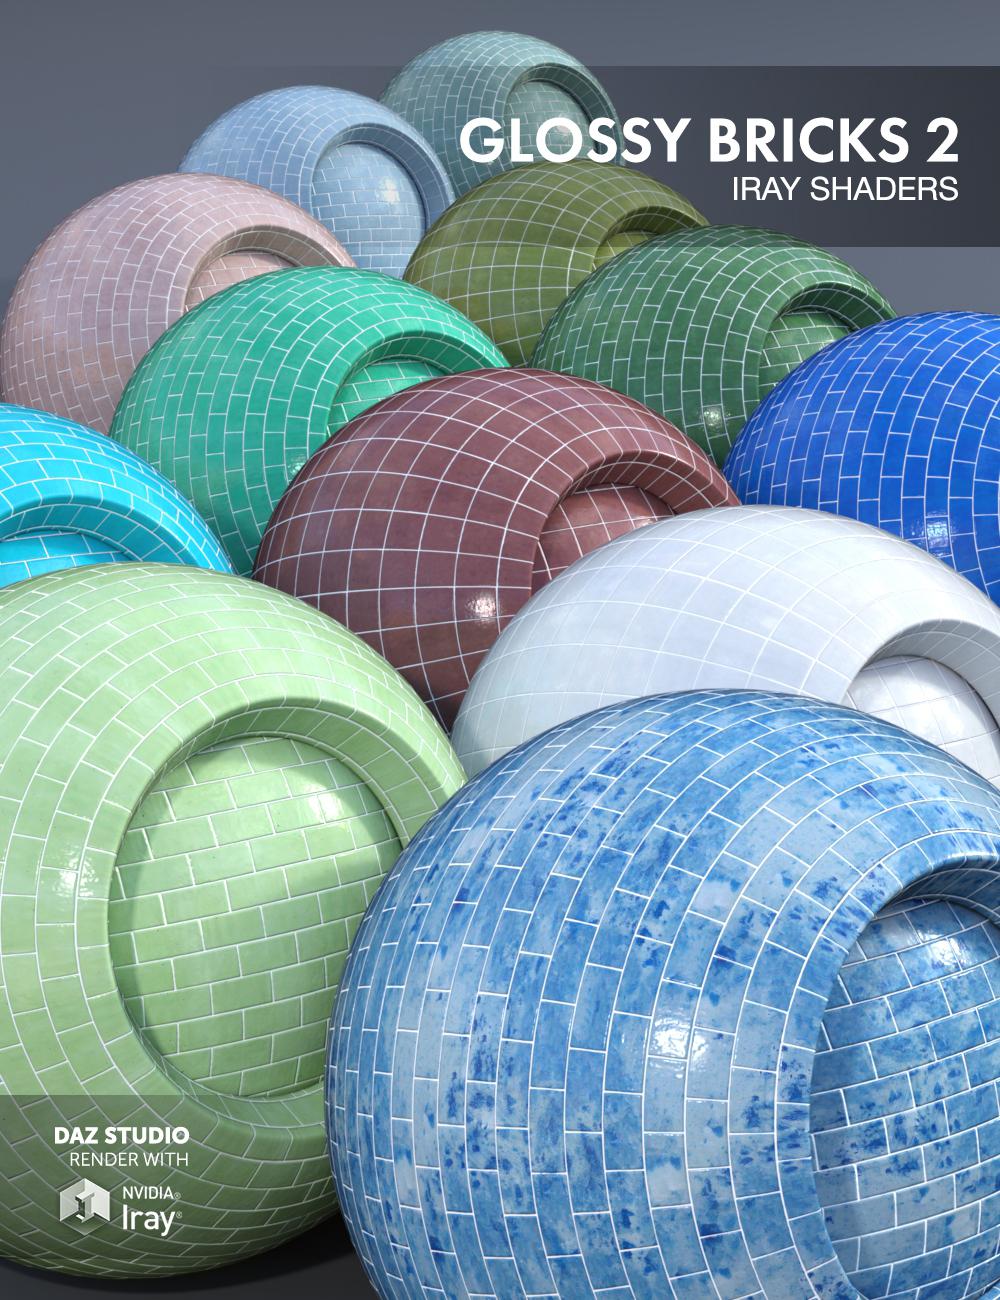 Glossy Bricks 2 - Iray Shaders by: Dimidrol, 3D Models by Daz 3D